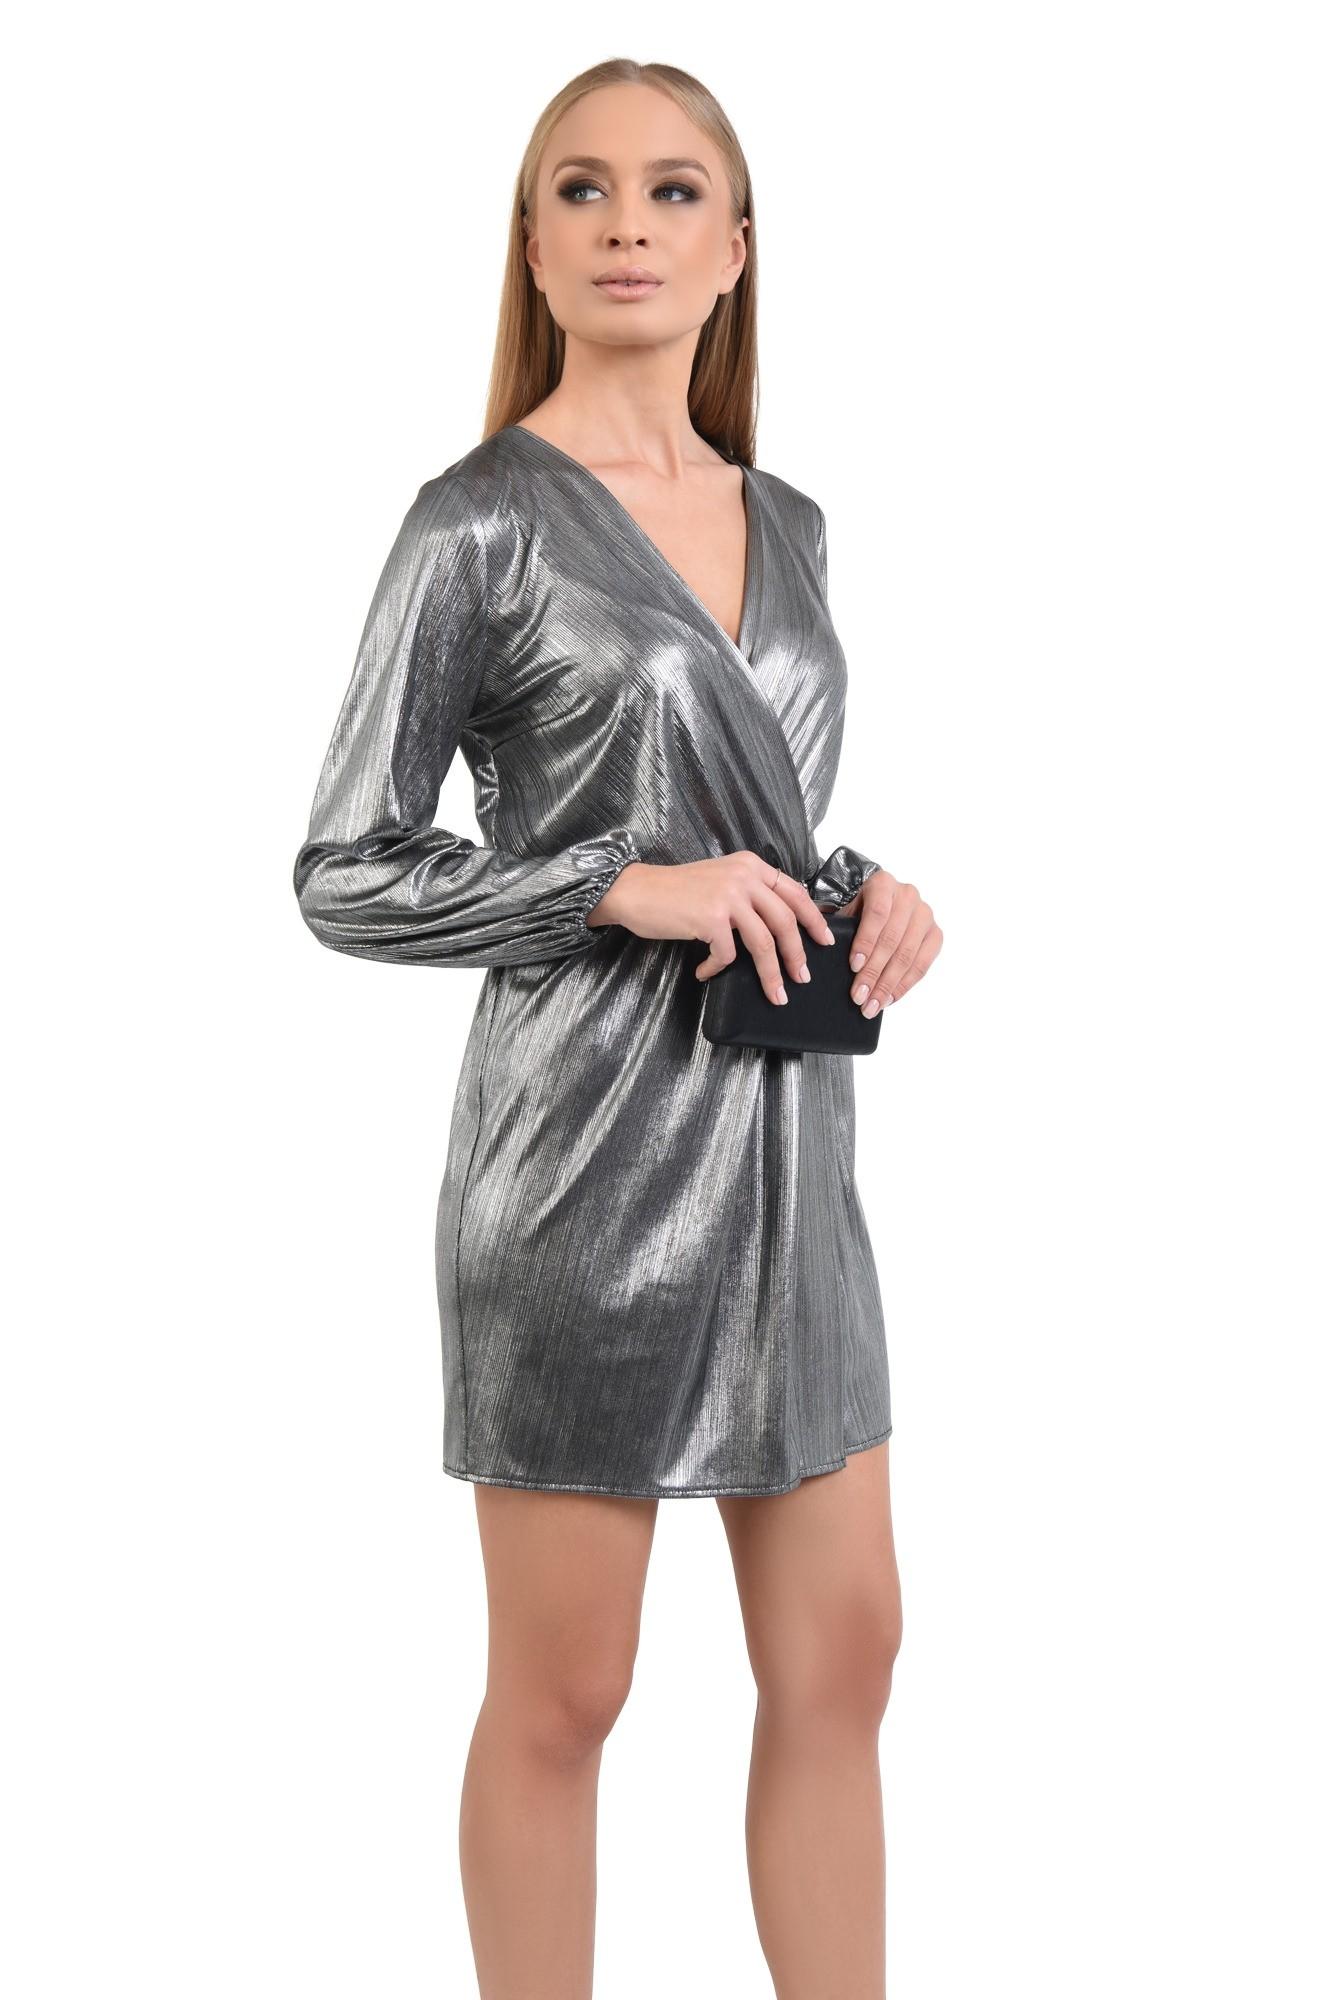 rochie de seara, lurex argintiu, talie elastica, anchior petrecut